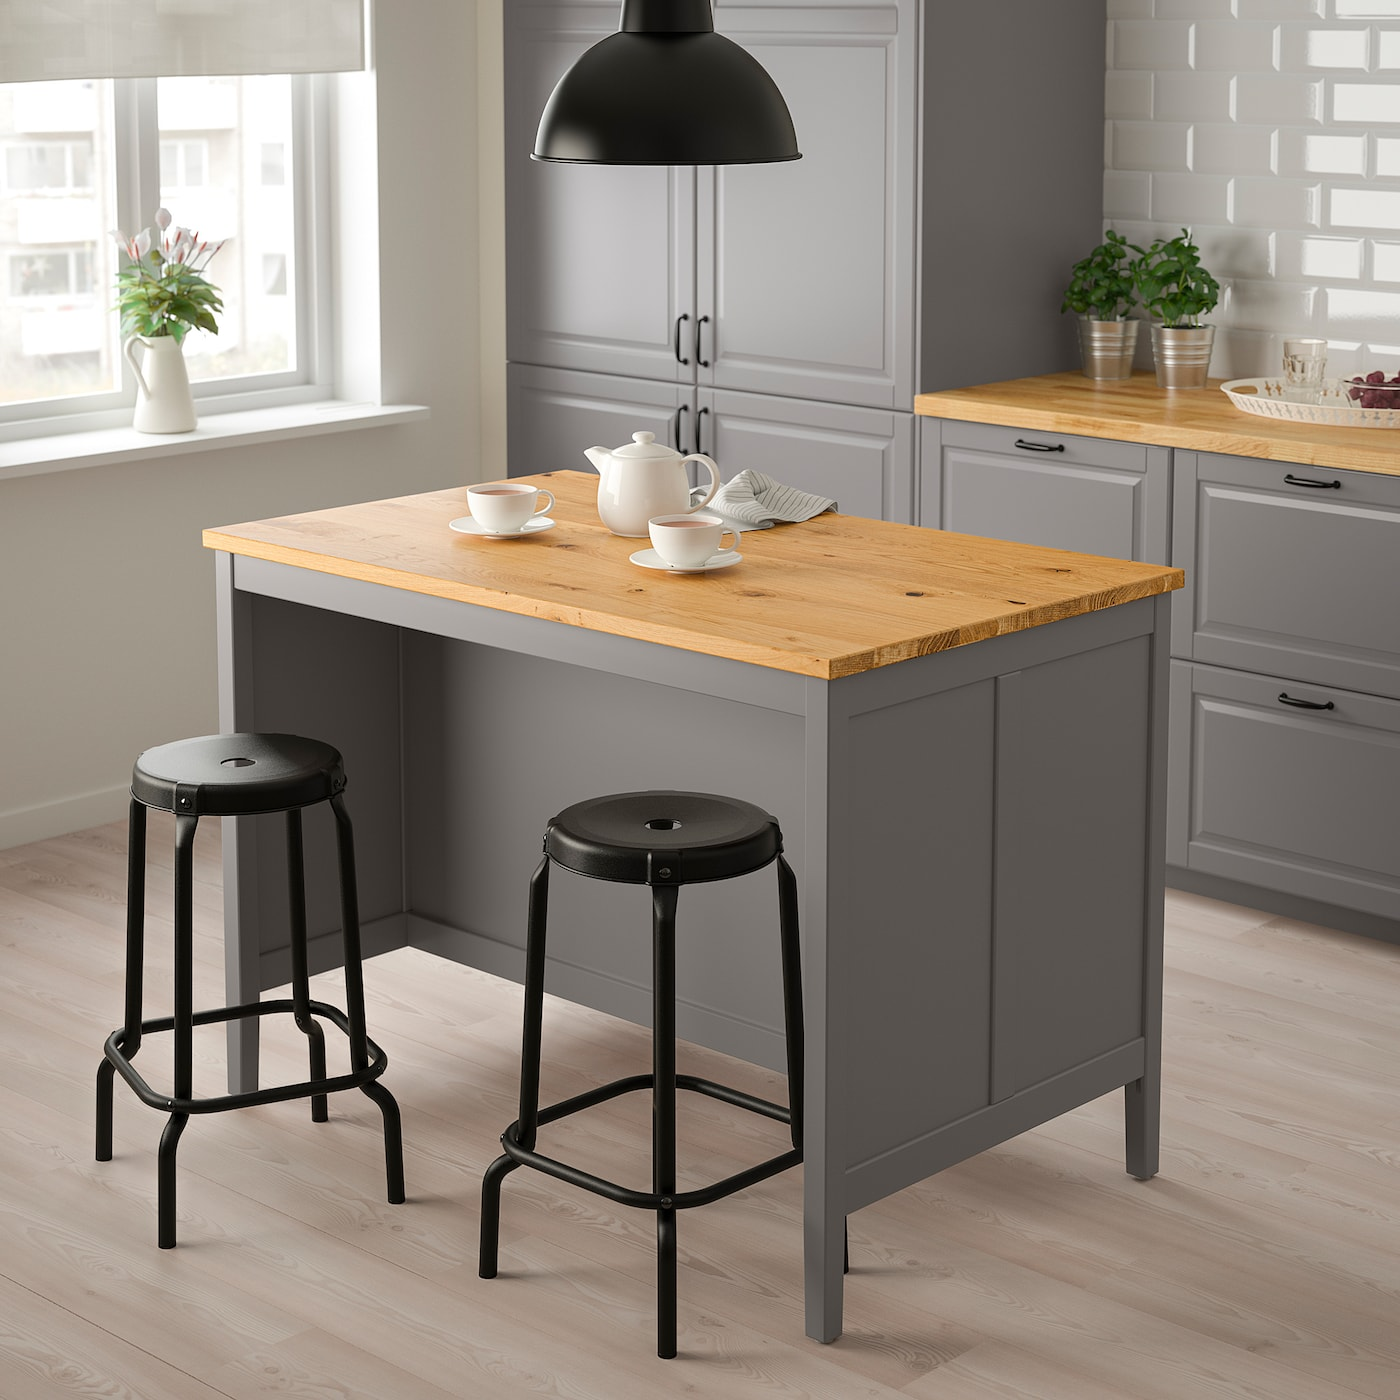 "TORNVIKEN Kitchen island, gray/oak, 49 5/8x30 3/8 """